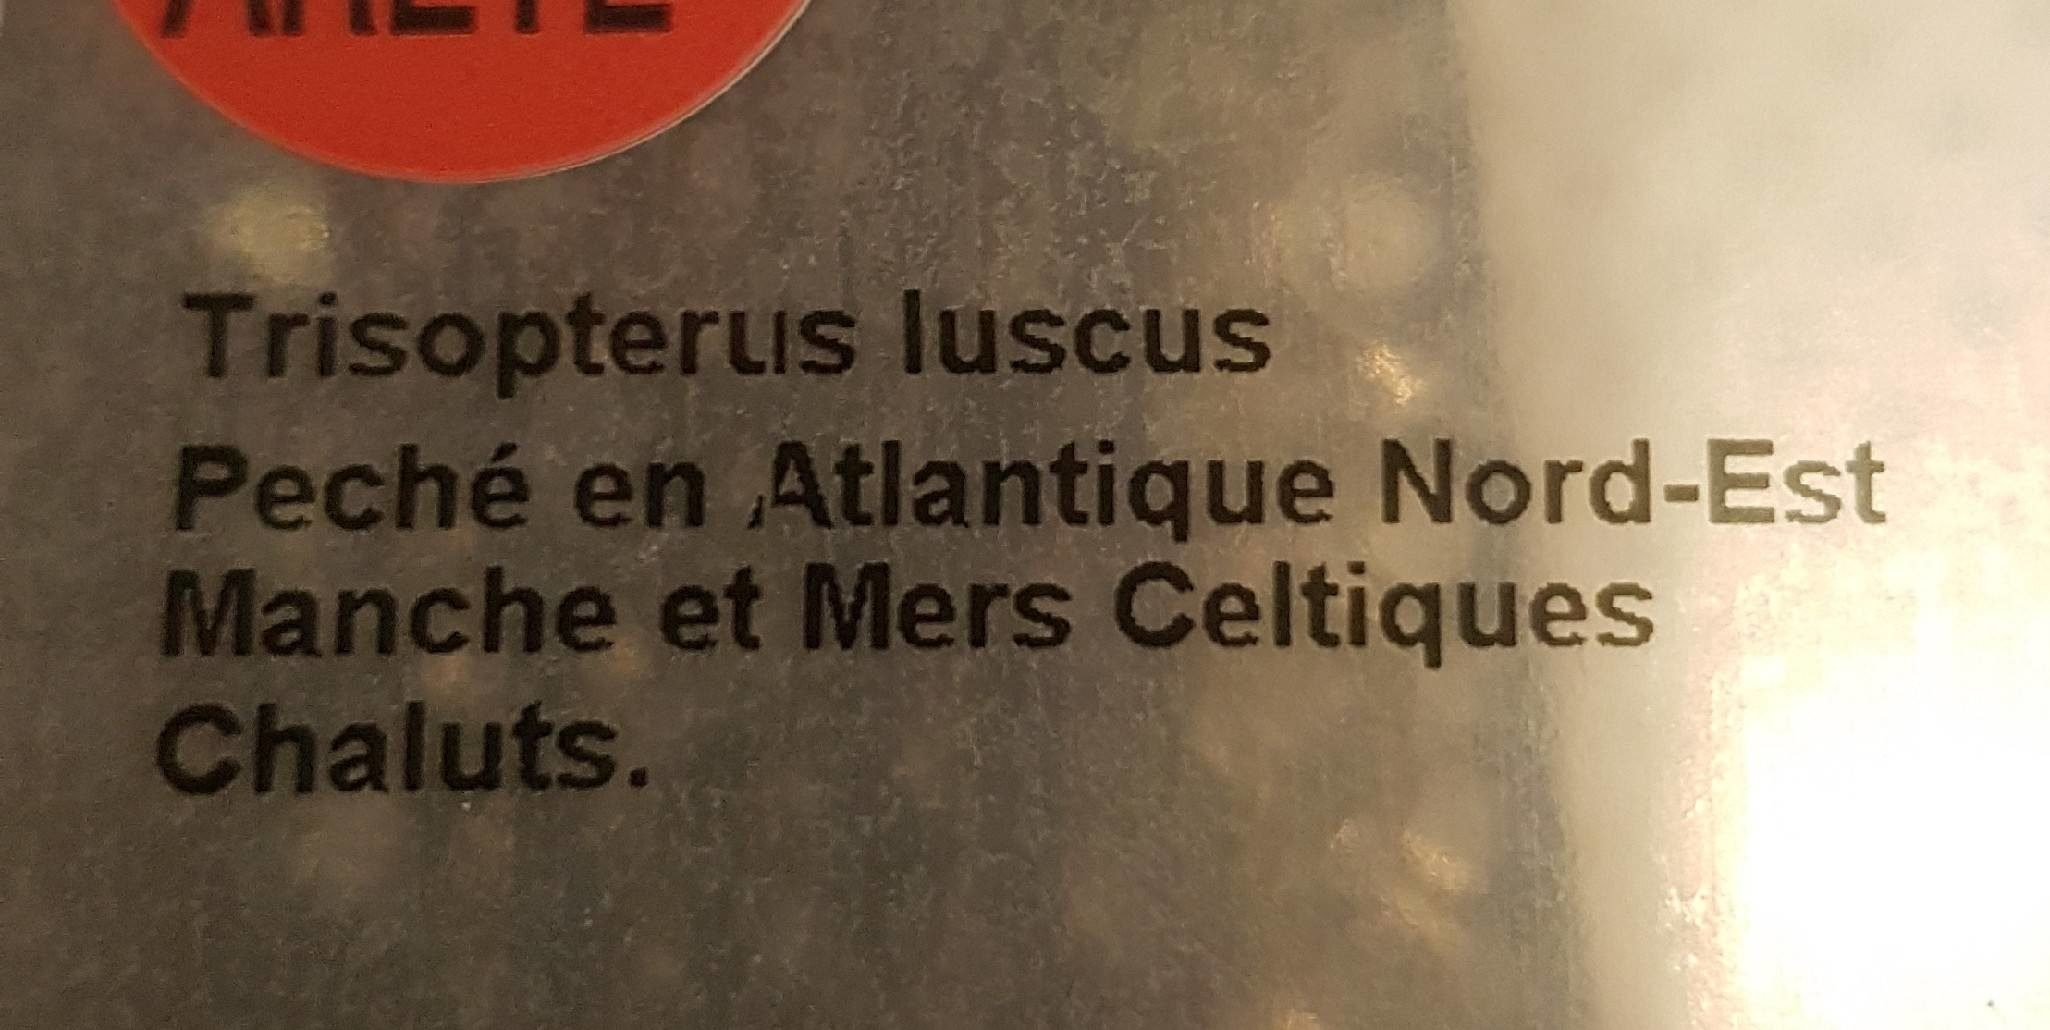 Filets de tacaud - Ingrediënten - fr